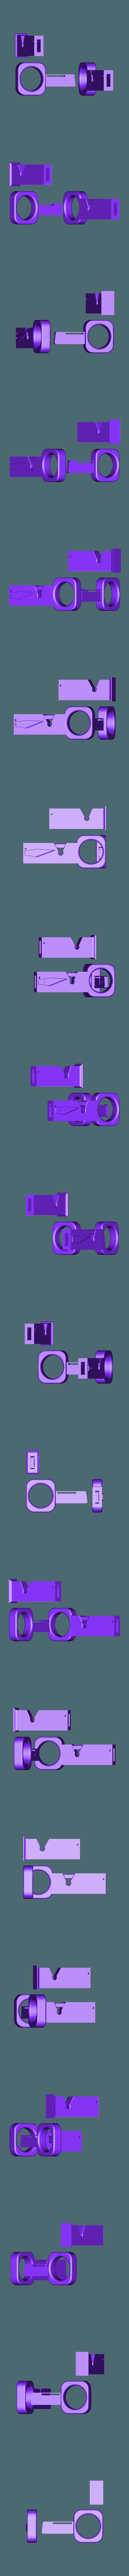 coupe ptfe scalpel 4.stl Download free STL file scalpel ptfe cut • 3D printing design, Cyborg